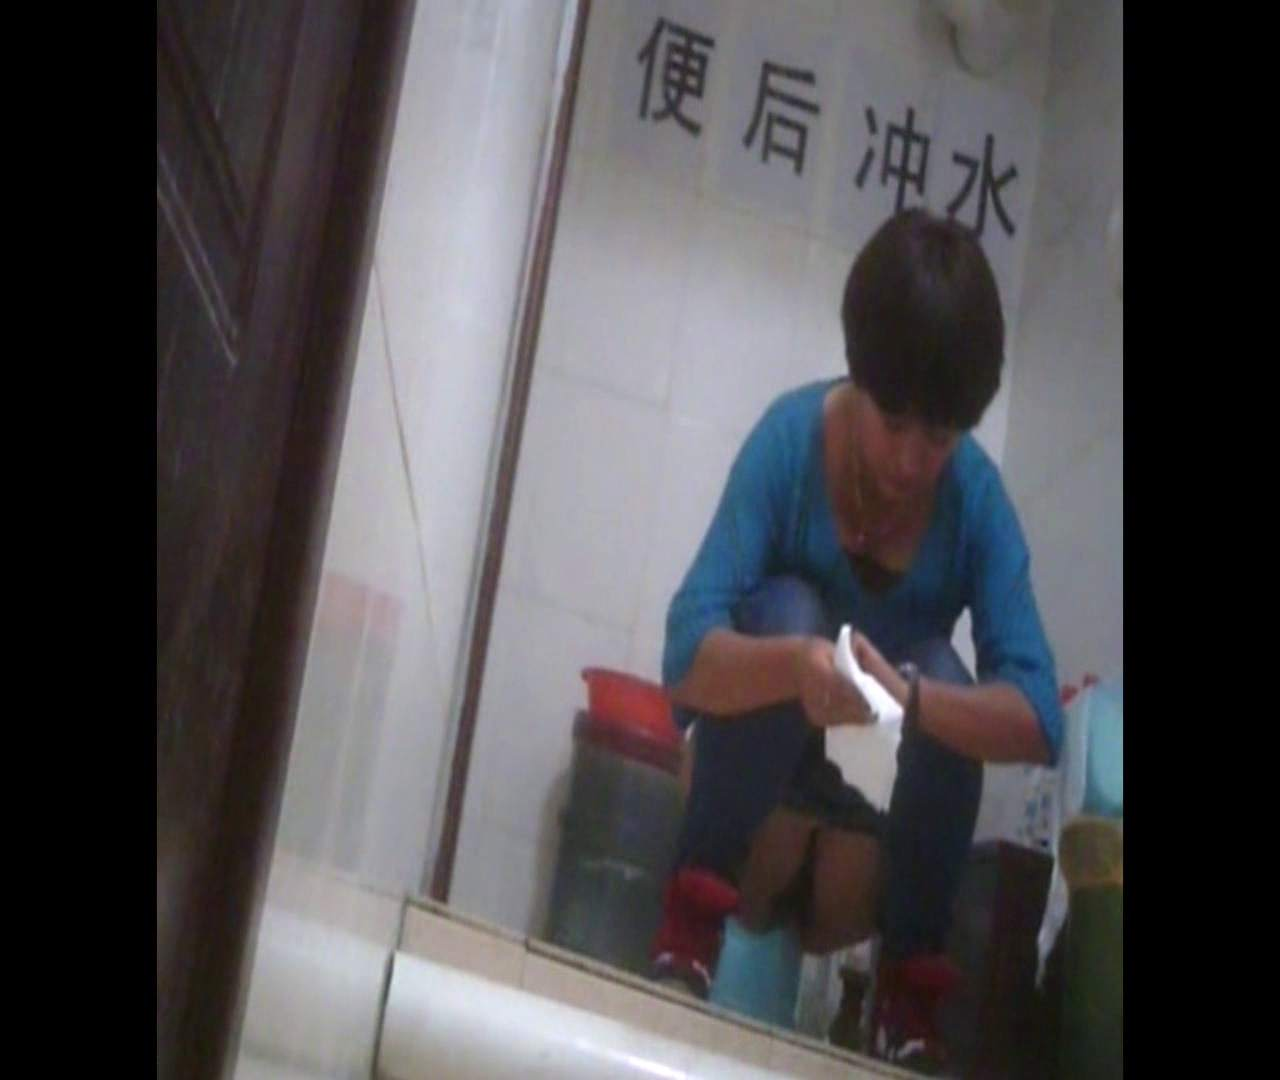 Vol.37 豊満な胸を持つマッシュルームカットな彼女 洗面所シーン 性交動画流出 57画像 23